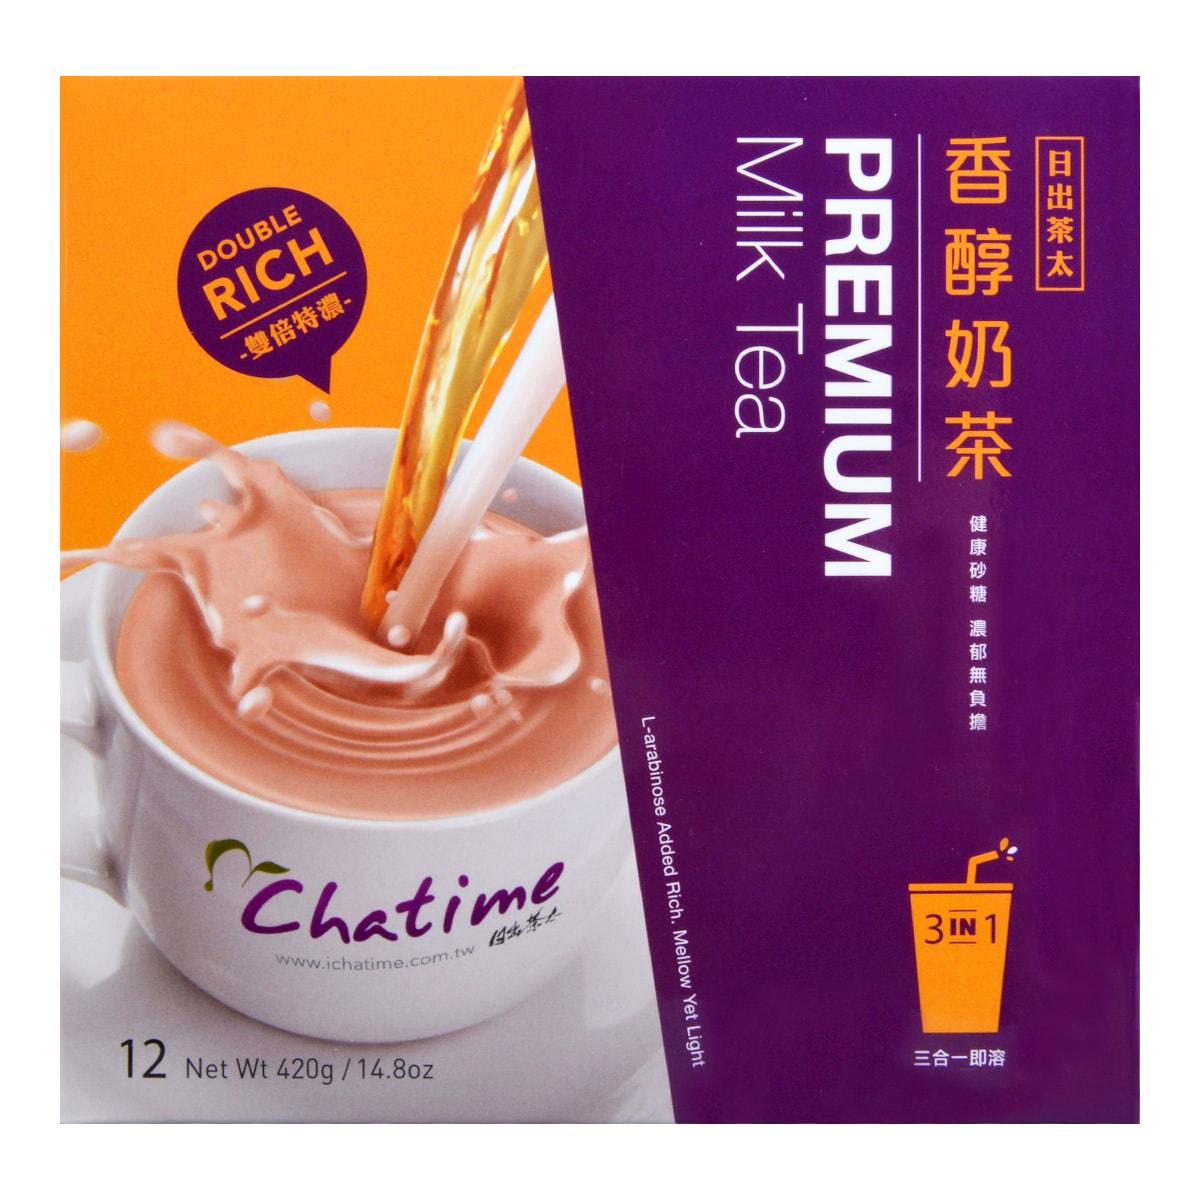 CHATIME Premium Milk Tea 12bags 420g